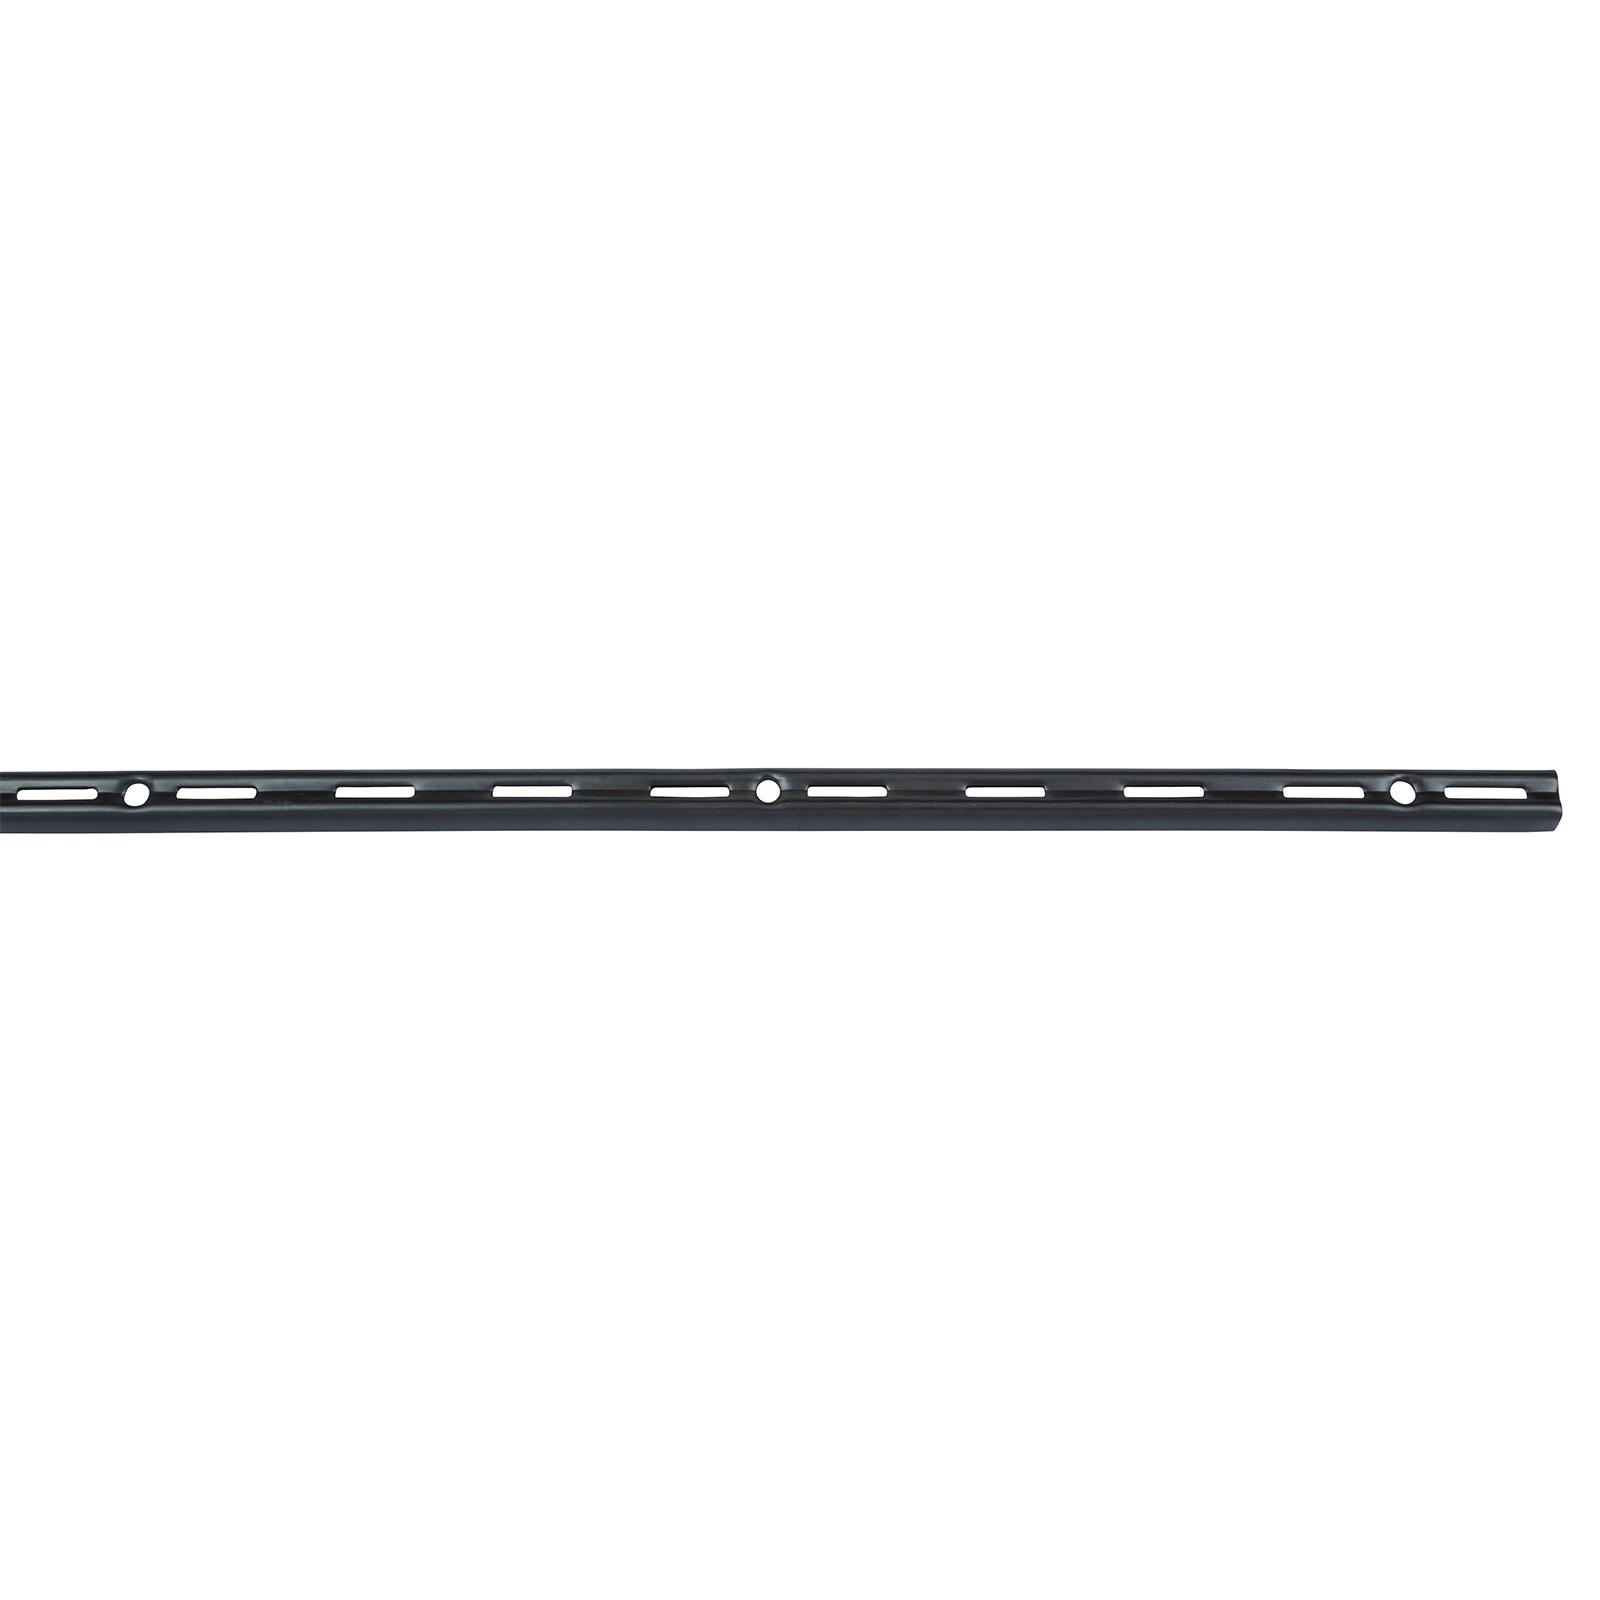 Flexi Storage 1500mm Black Single Slot Upright